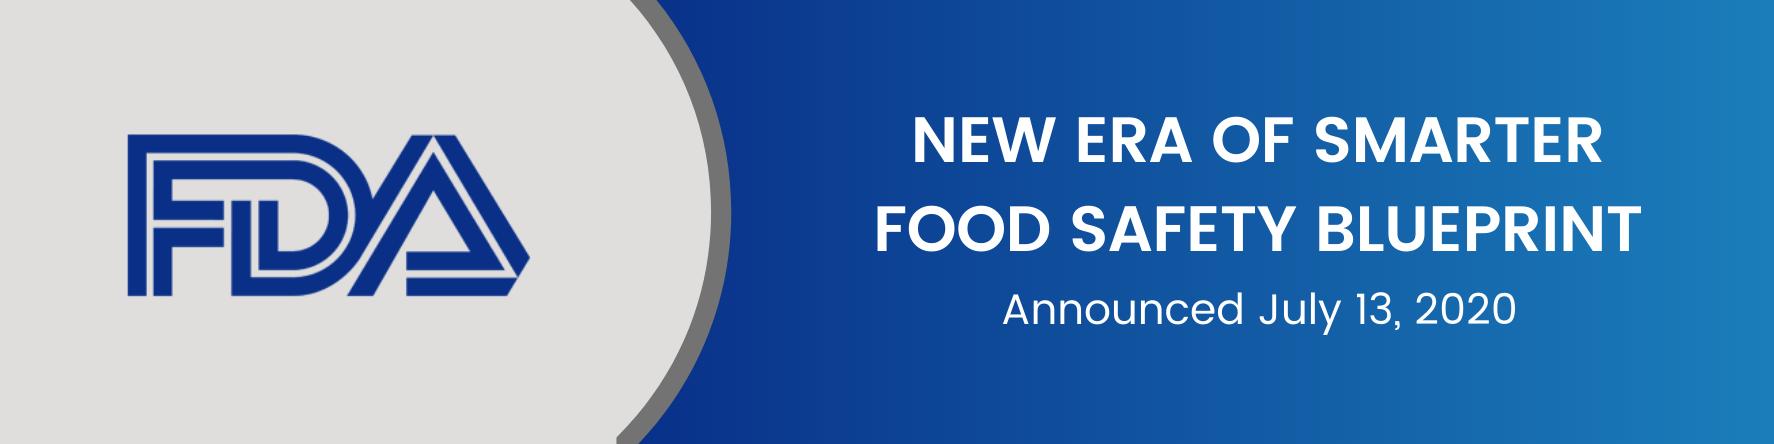 New Era of Smarter Food Safety Blueprint